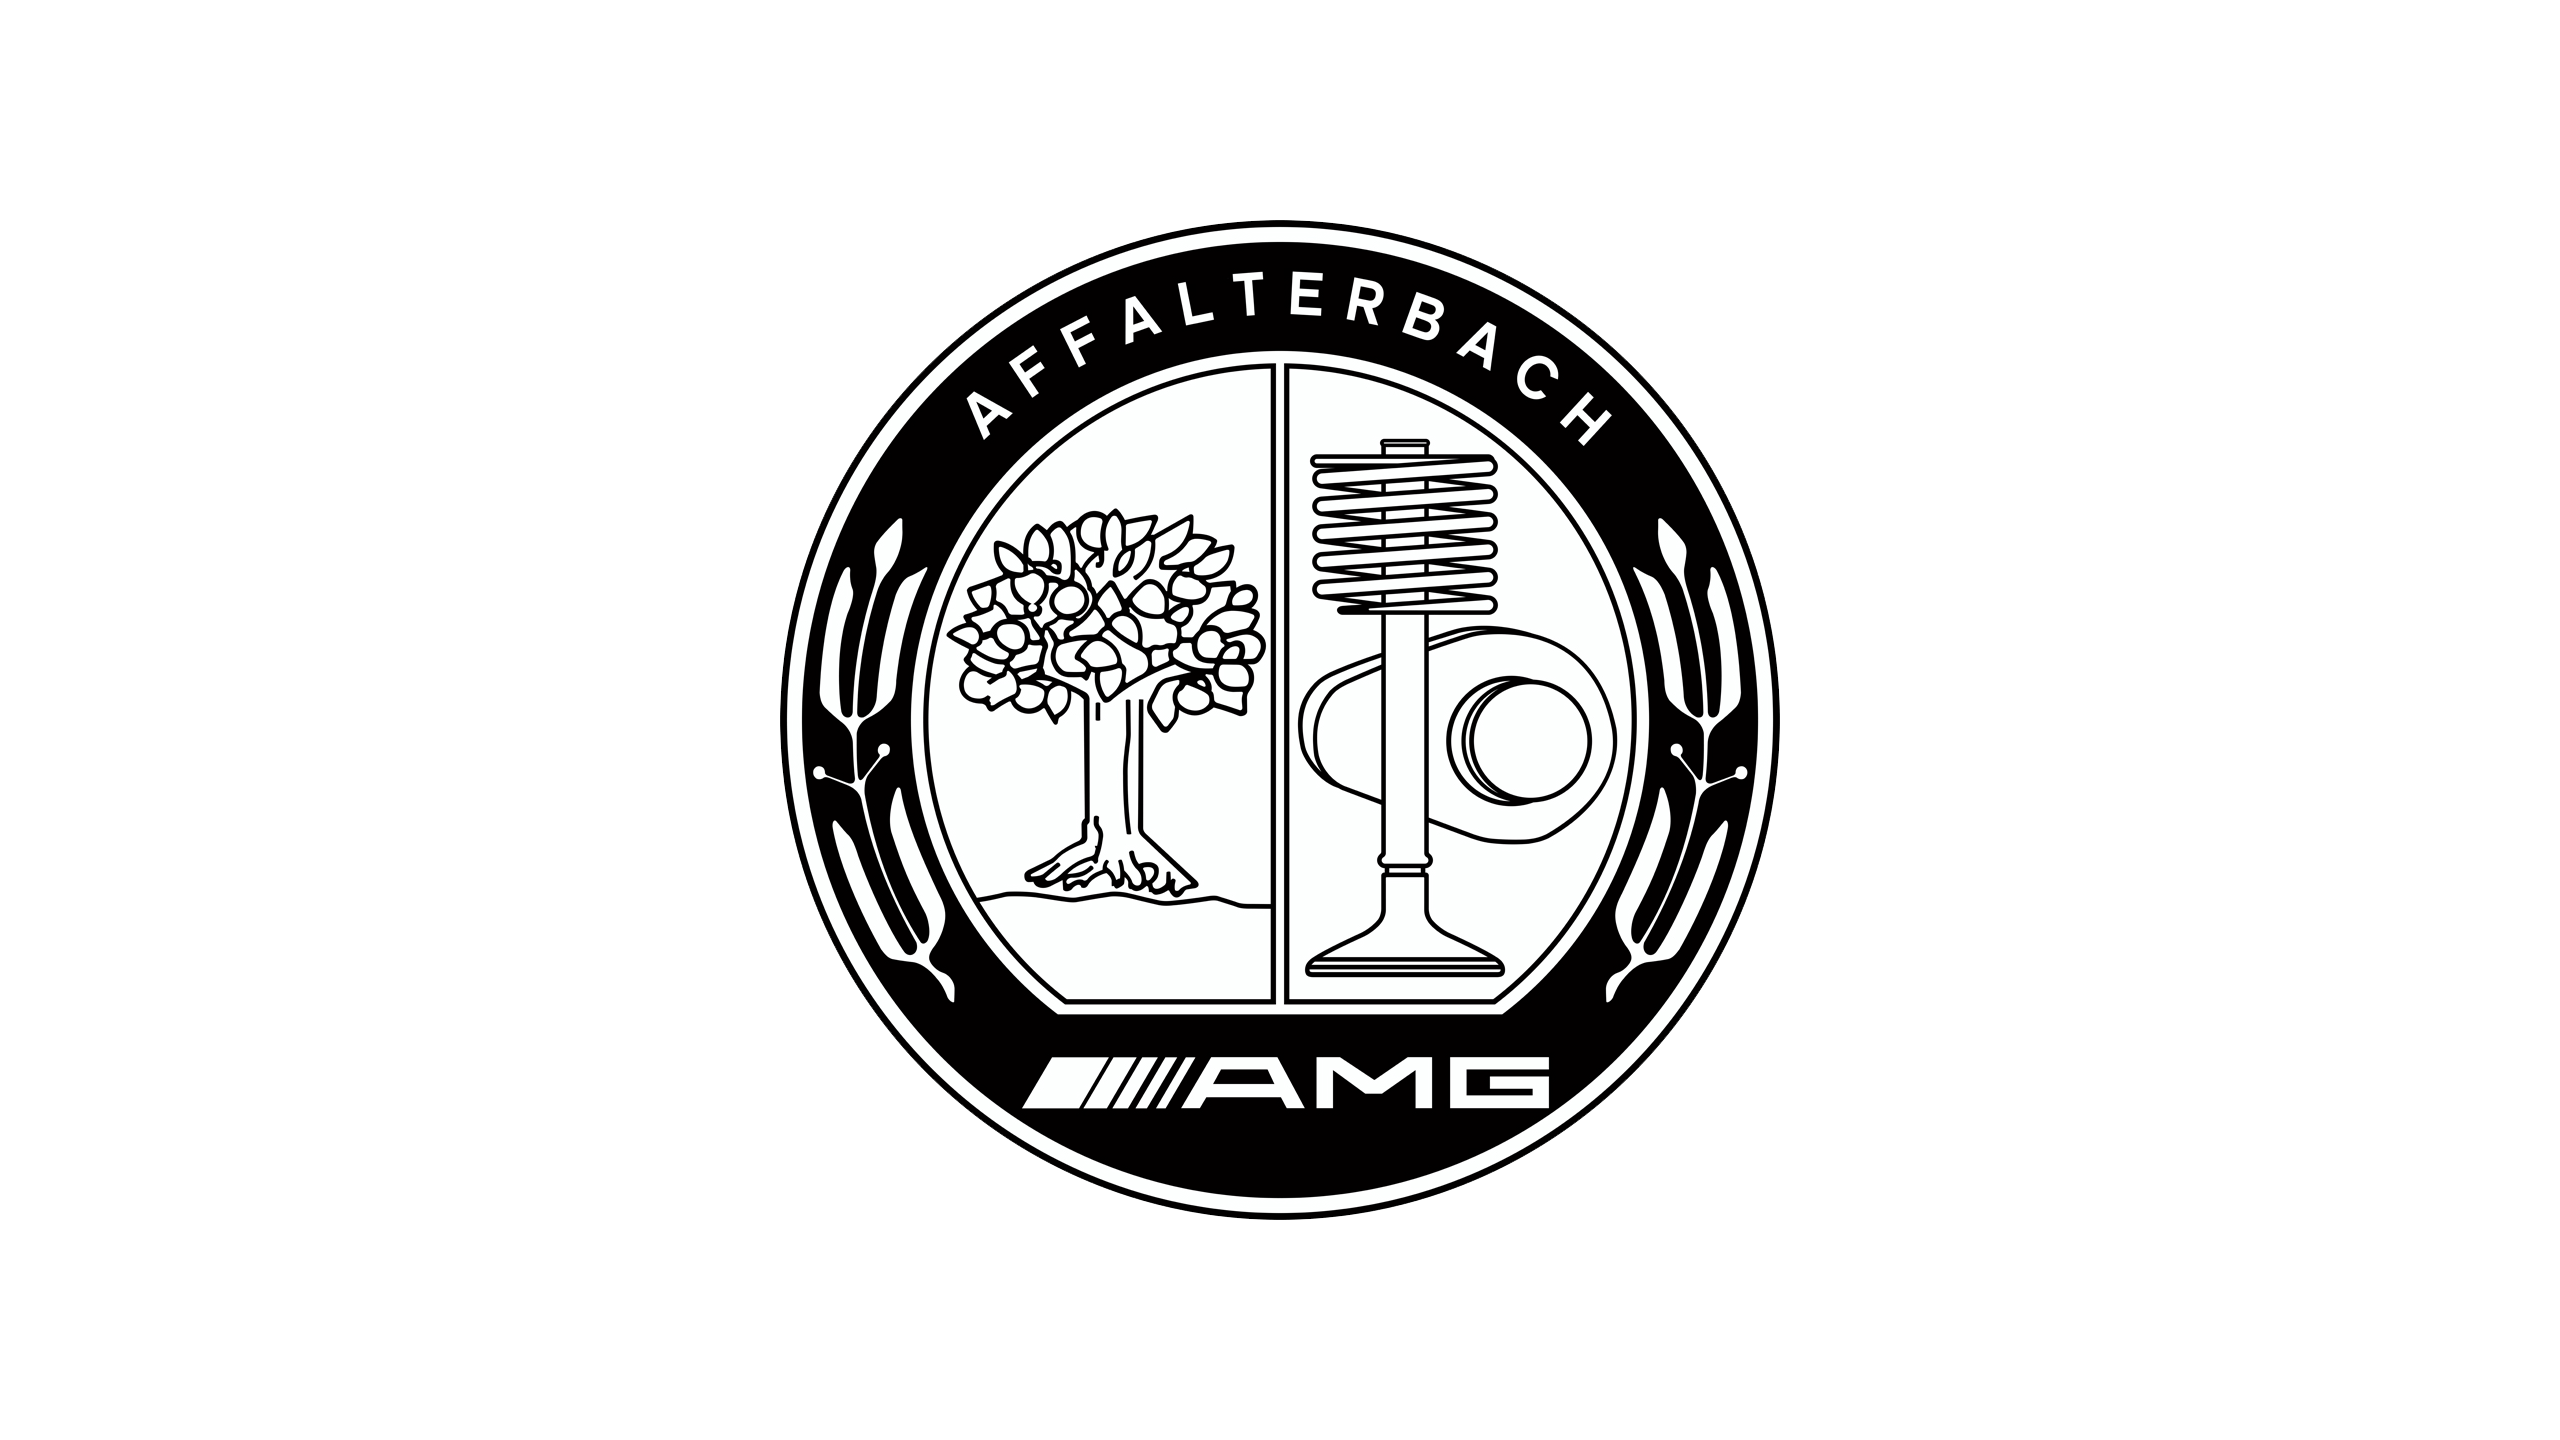 Mercedes AMG Logo Wallpapers - Wallpaper Cave